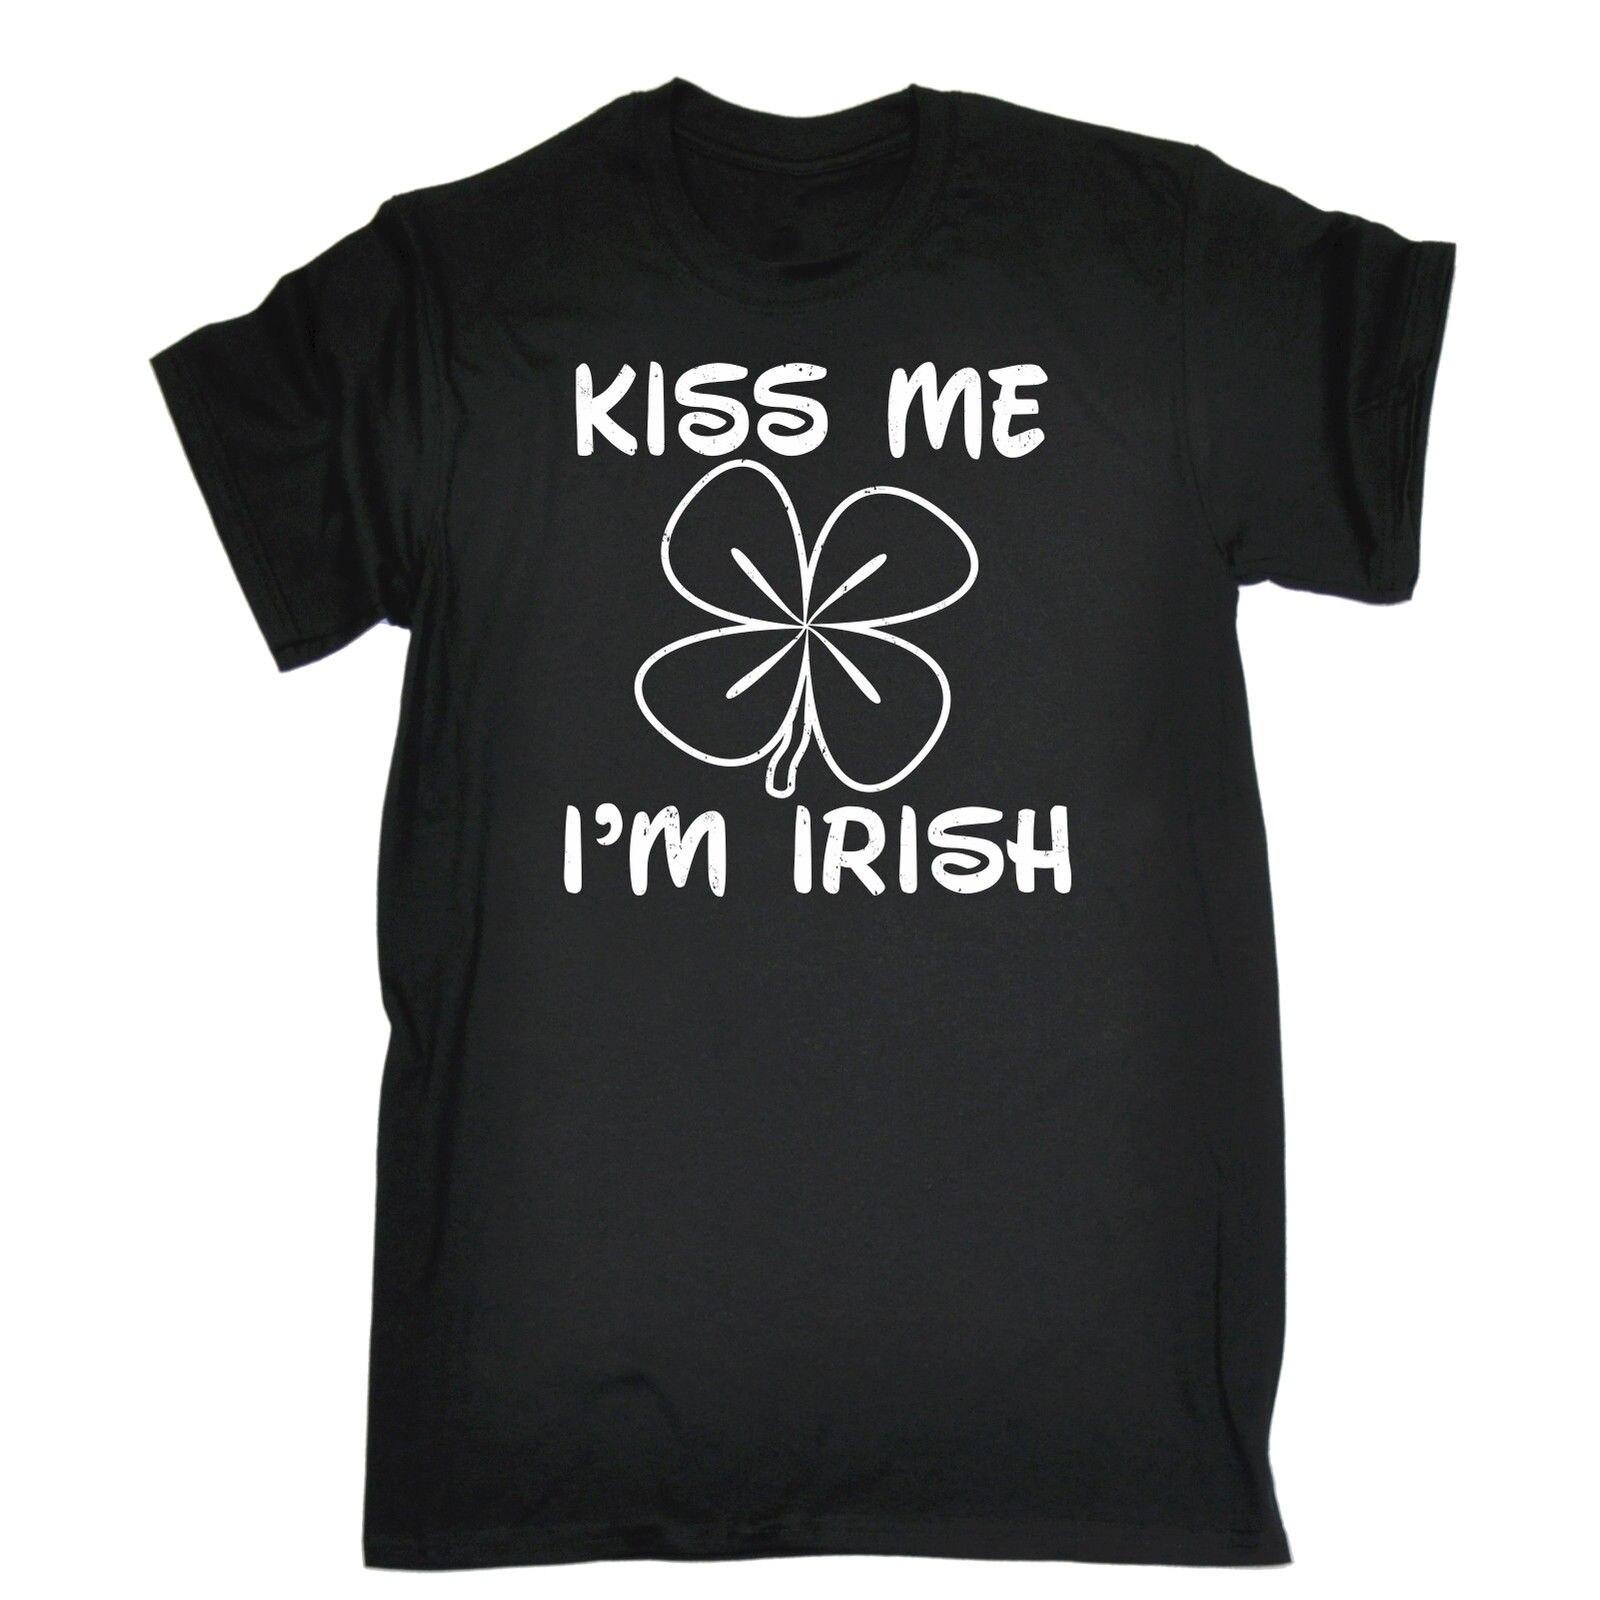 Kiss Me Im Irish T-SHIRT Tee Ireland St Patricks Day Humour Funny Birthday Gift Normal Short Sleeve Cotton T Shirts